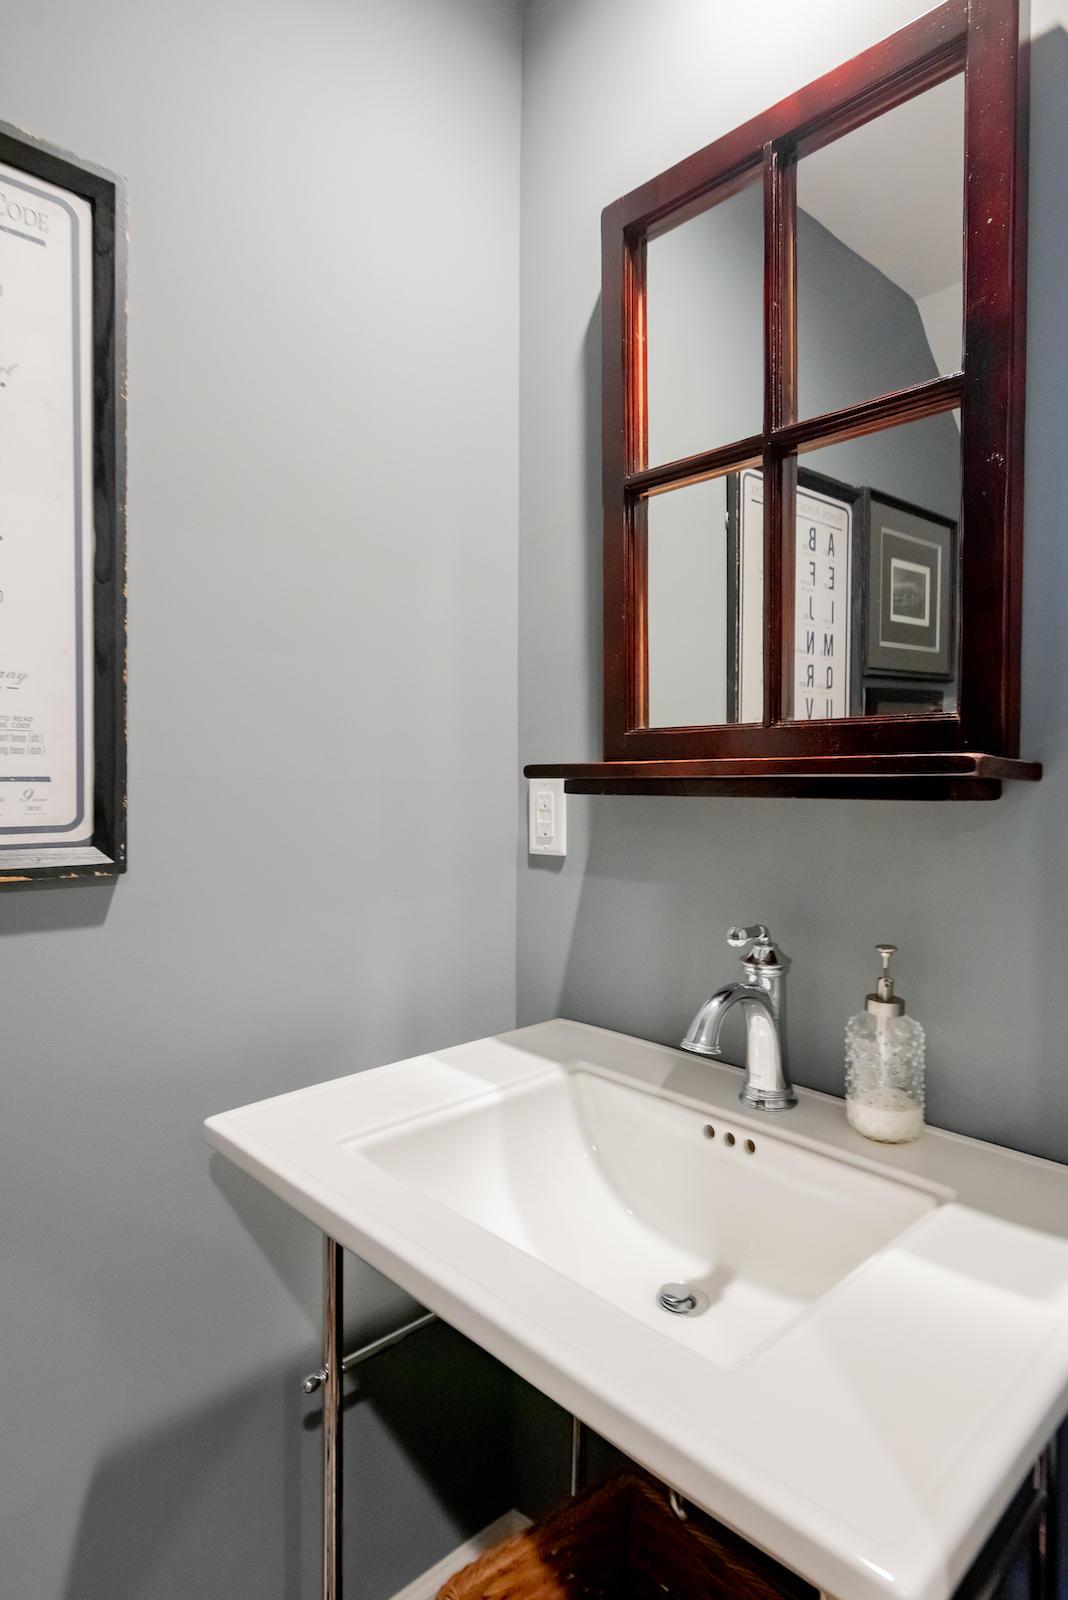 Harleston Village Homes For Sale - 15 Horlbeck, Charleston, SC - 0